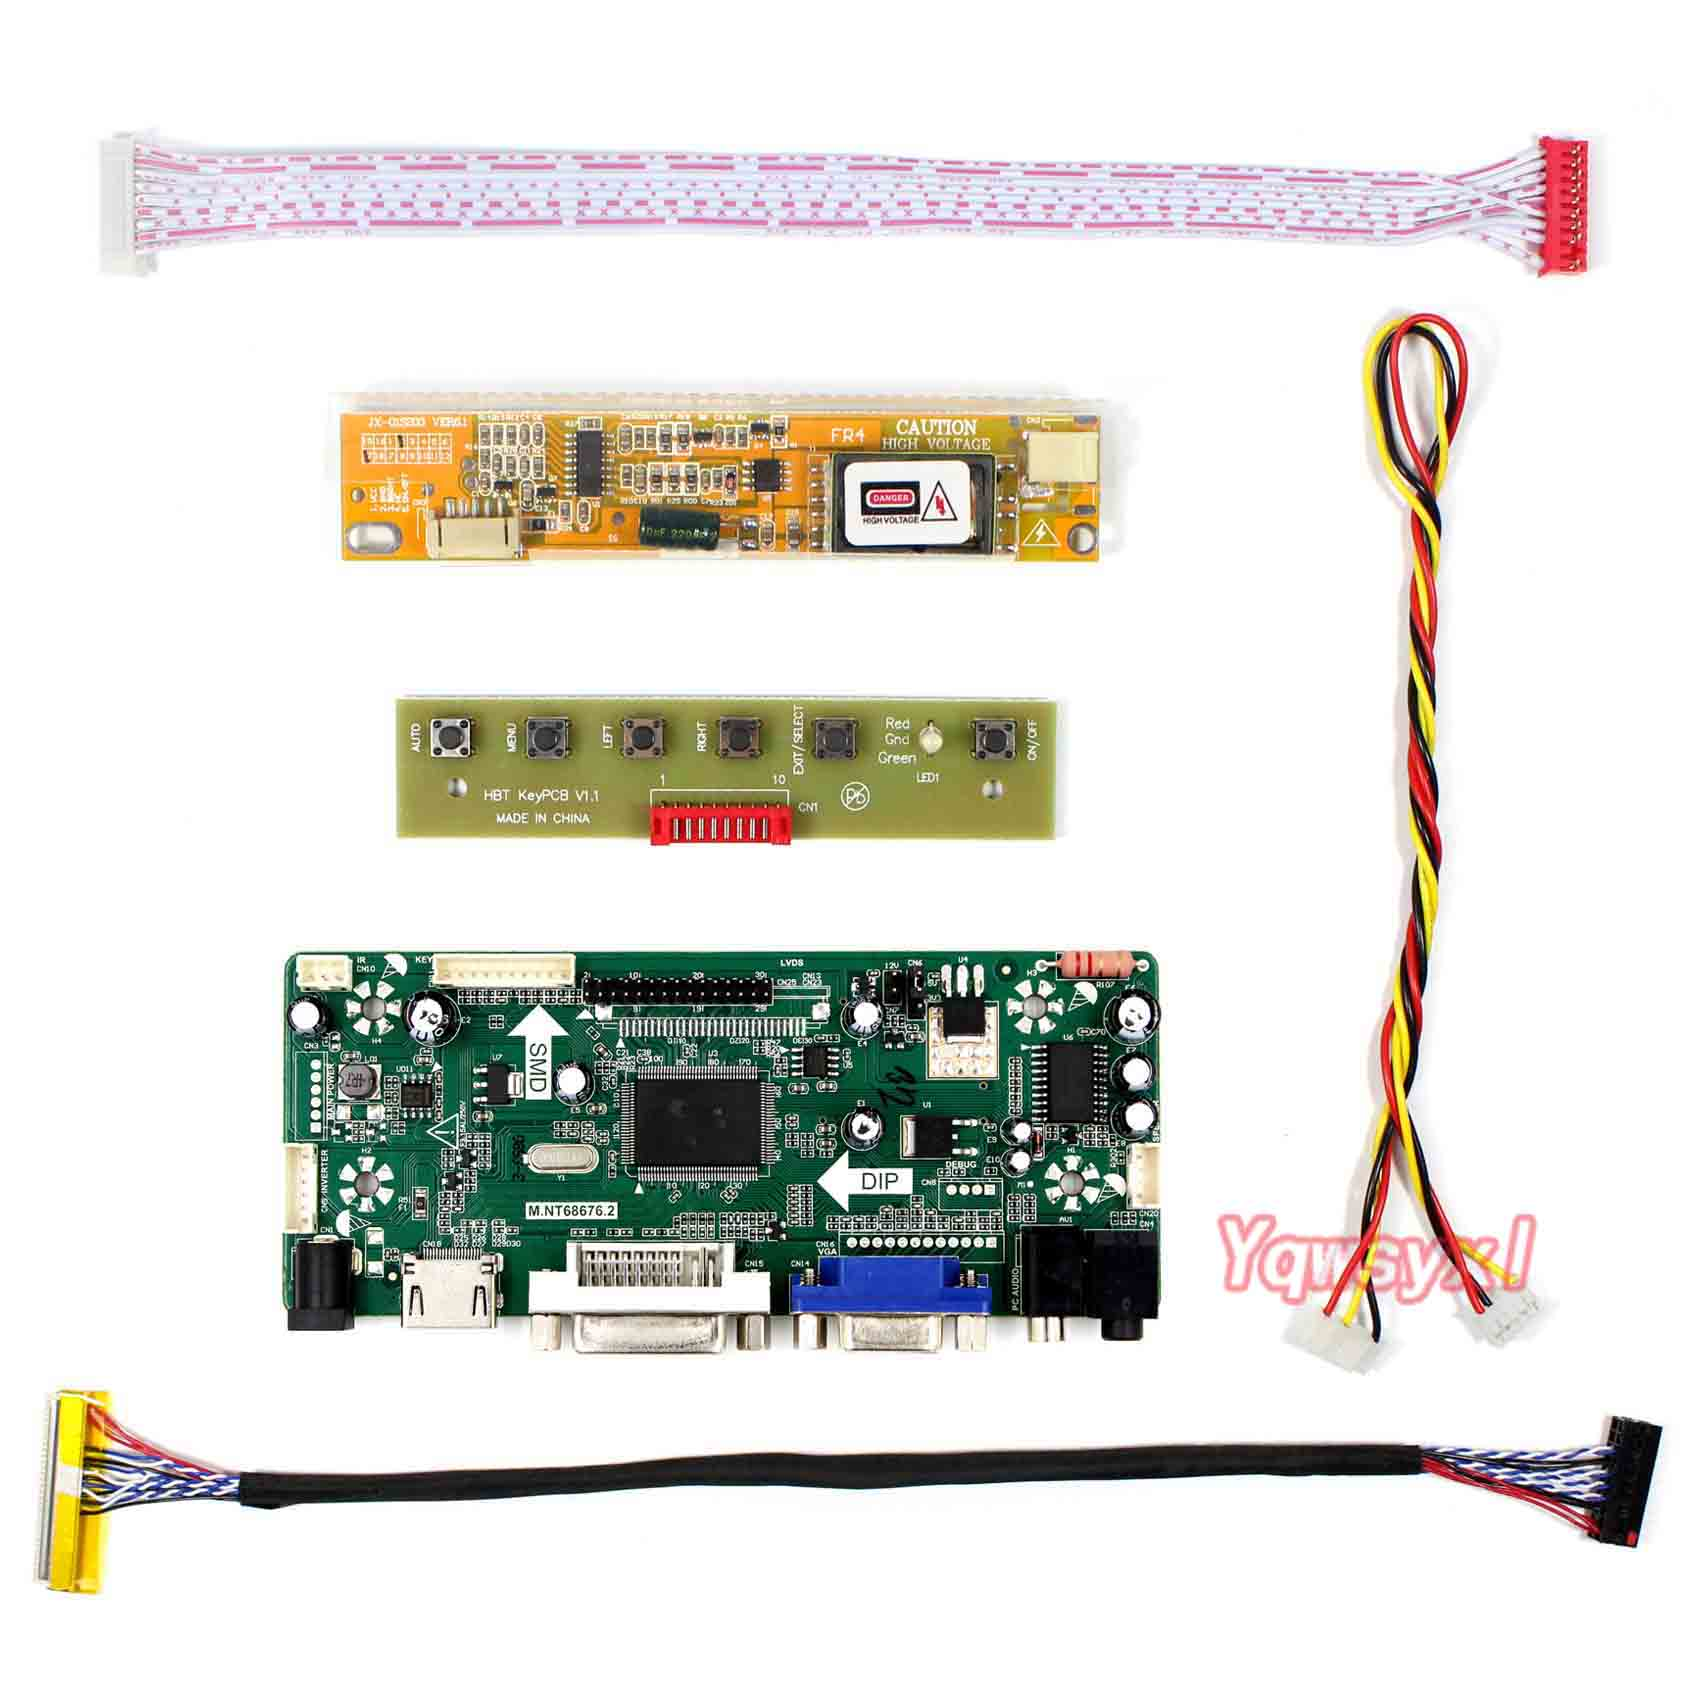 Yqwsyxl Control Board Monitor Kit For B141EW01 B141EW02 B141EW03  HDMI+DVI+VGA LCD LED Screen Controller Board Driver